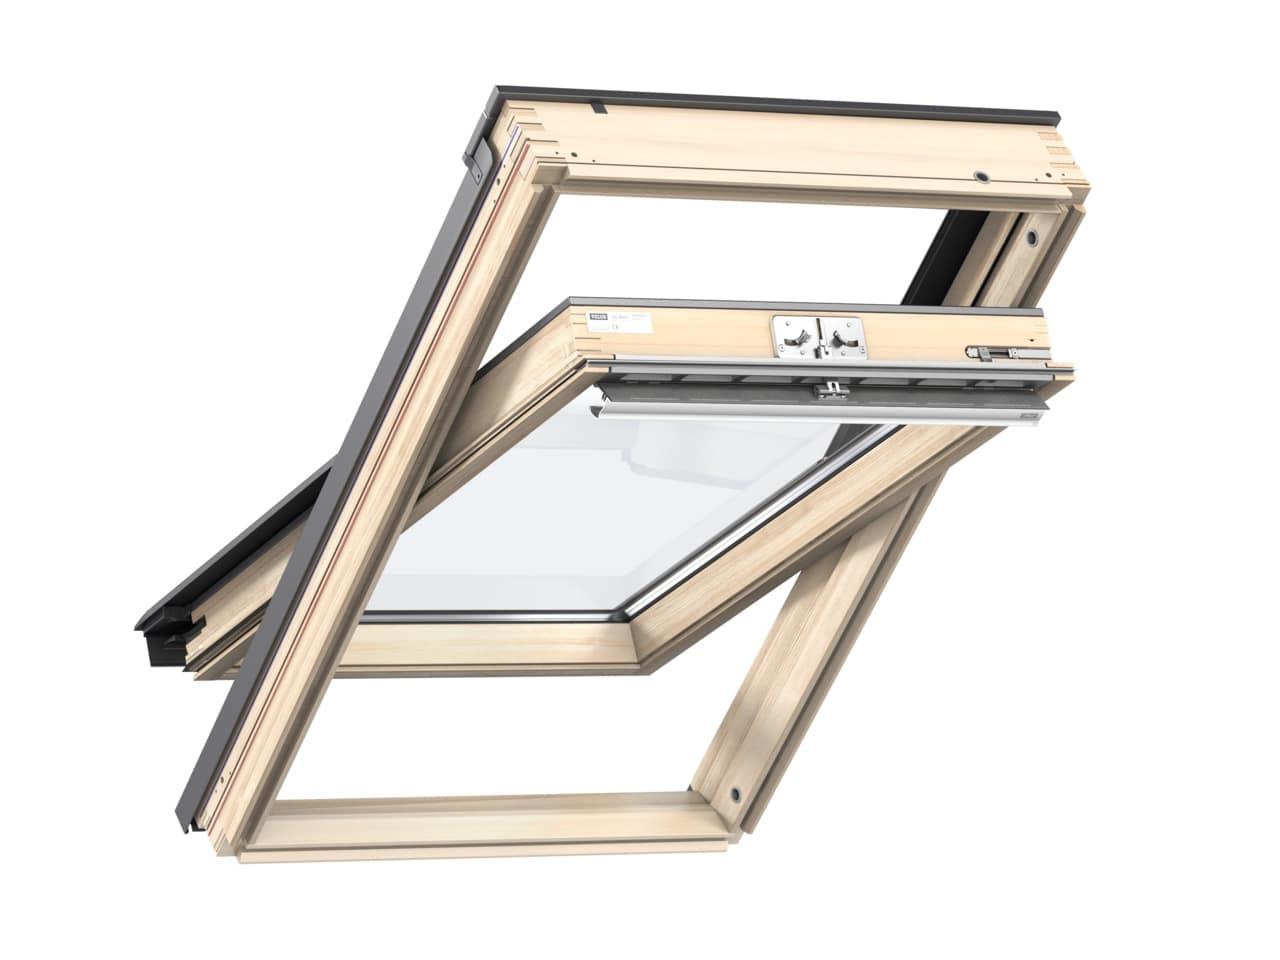 okna dachowe velux GZL 1051 2 - VELUX okno kolankowe VFE 3070 2-szybowe